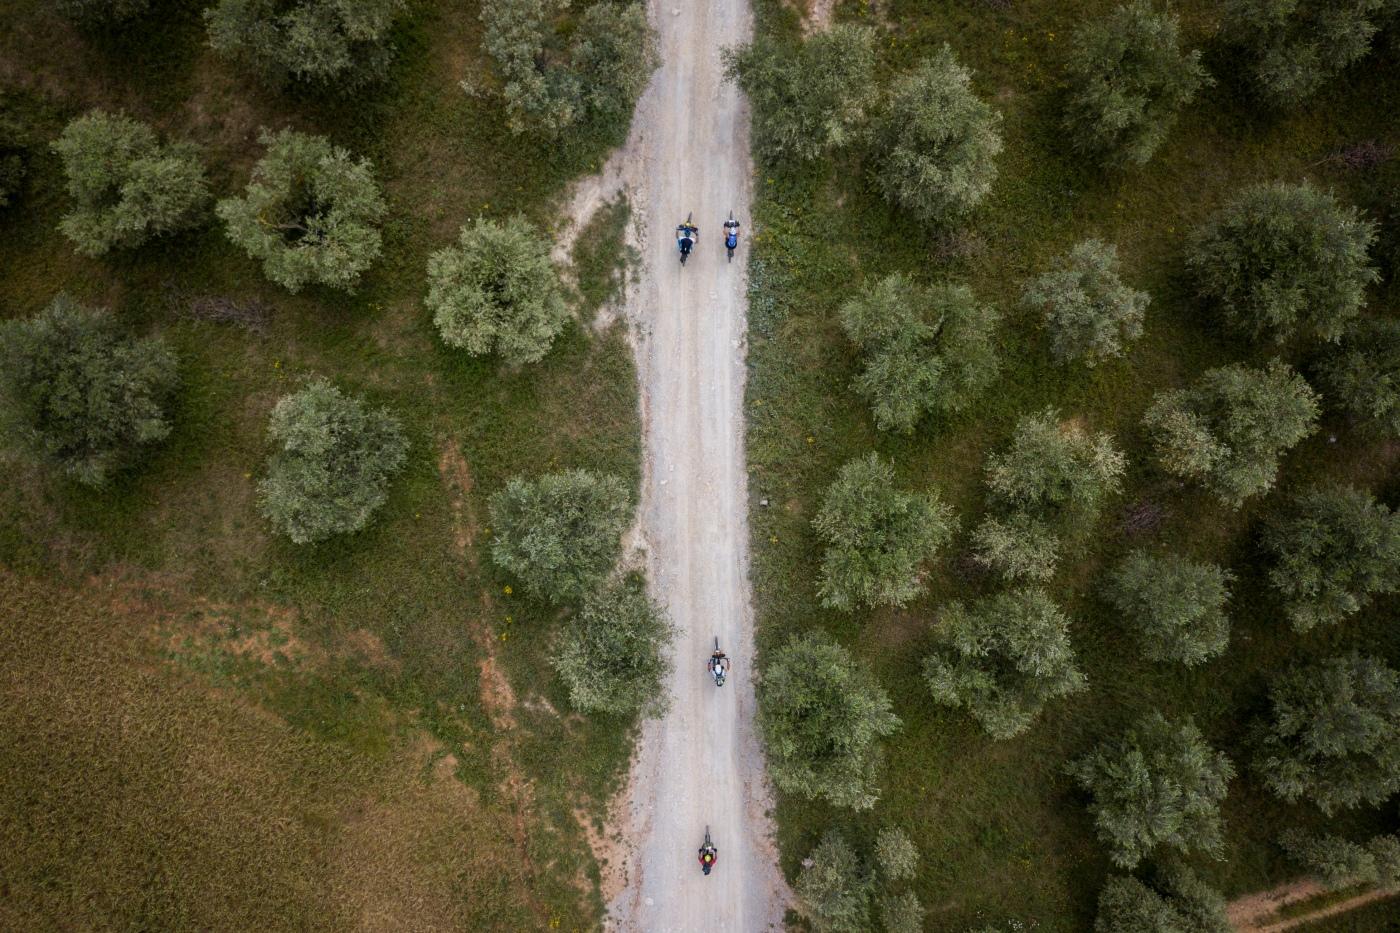 tuscany-trail-2018-003